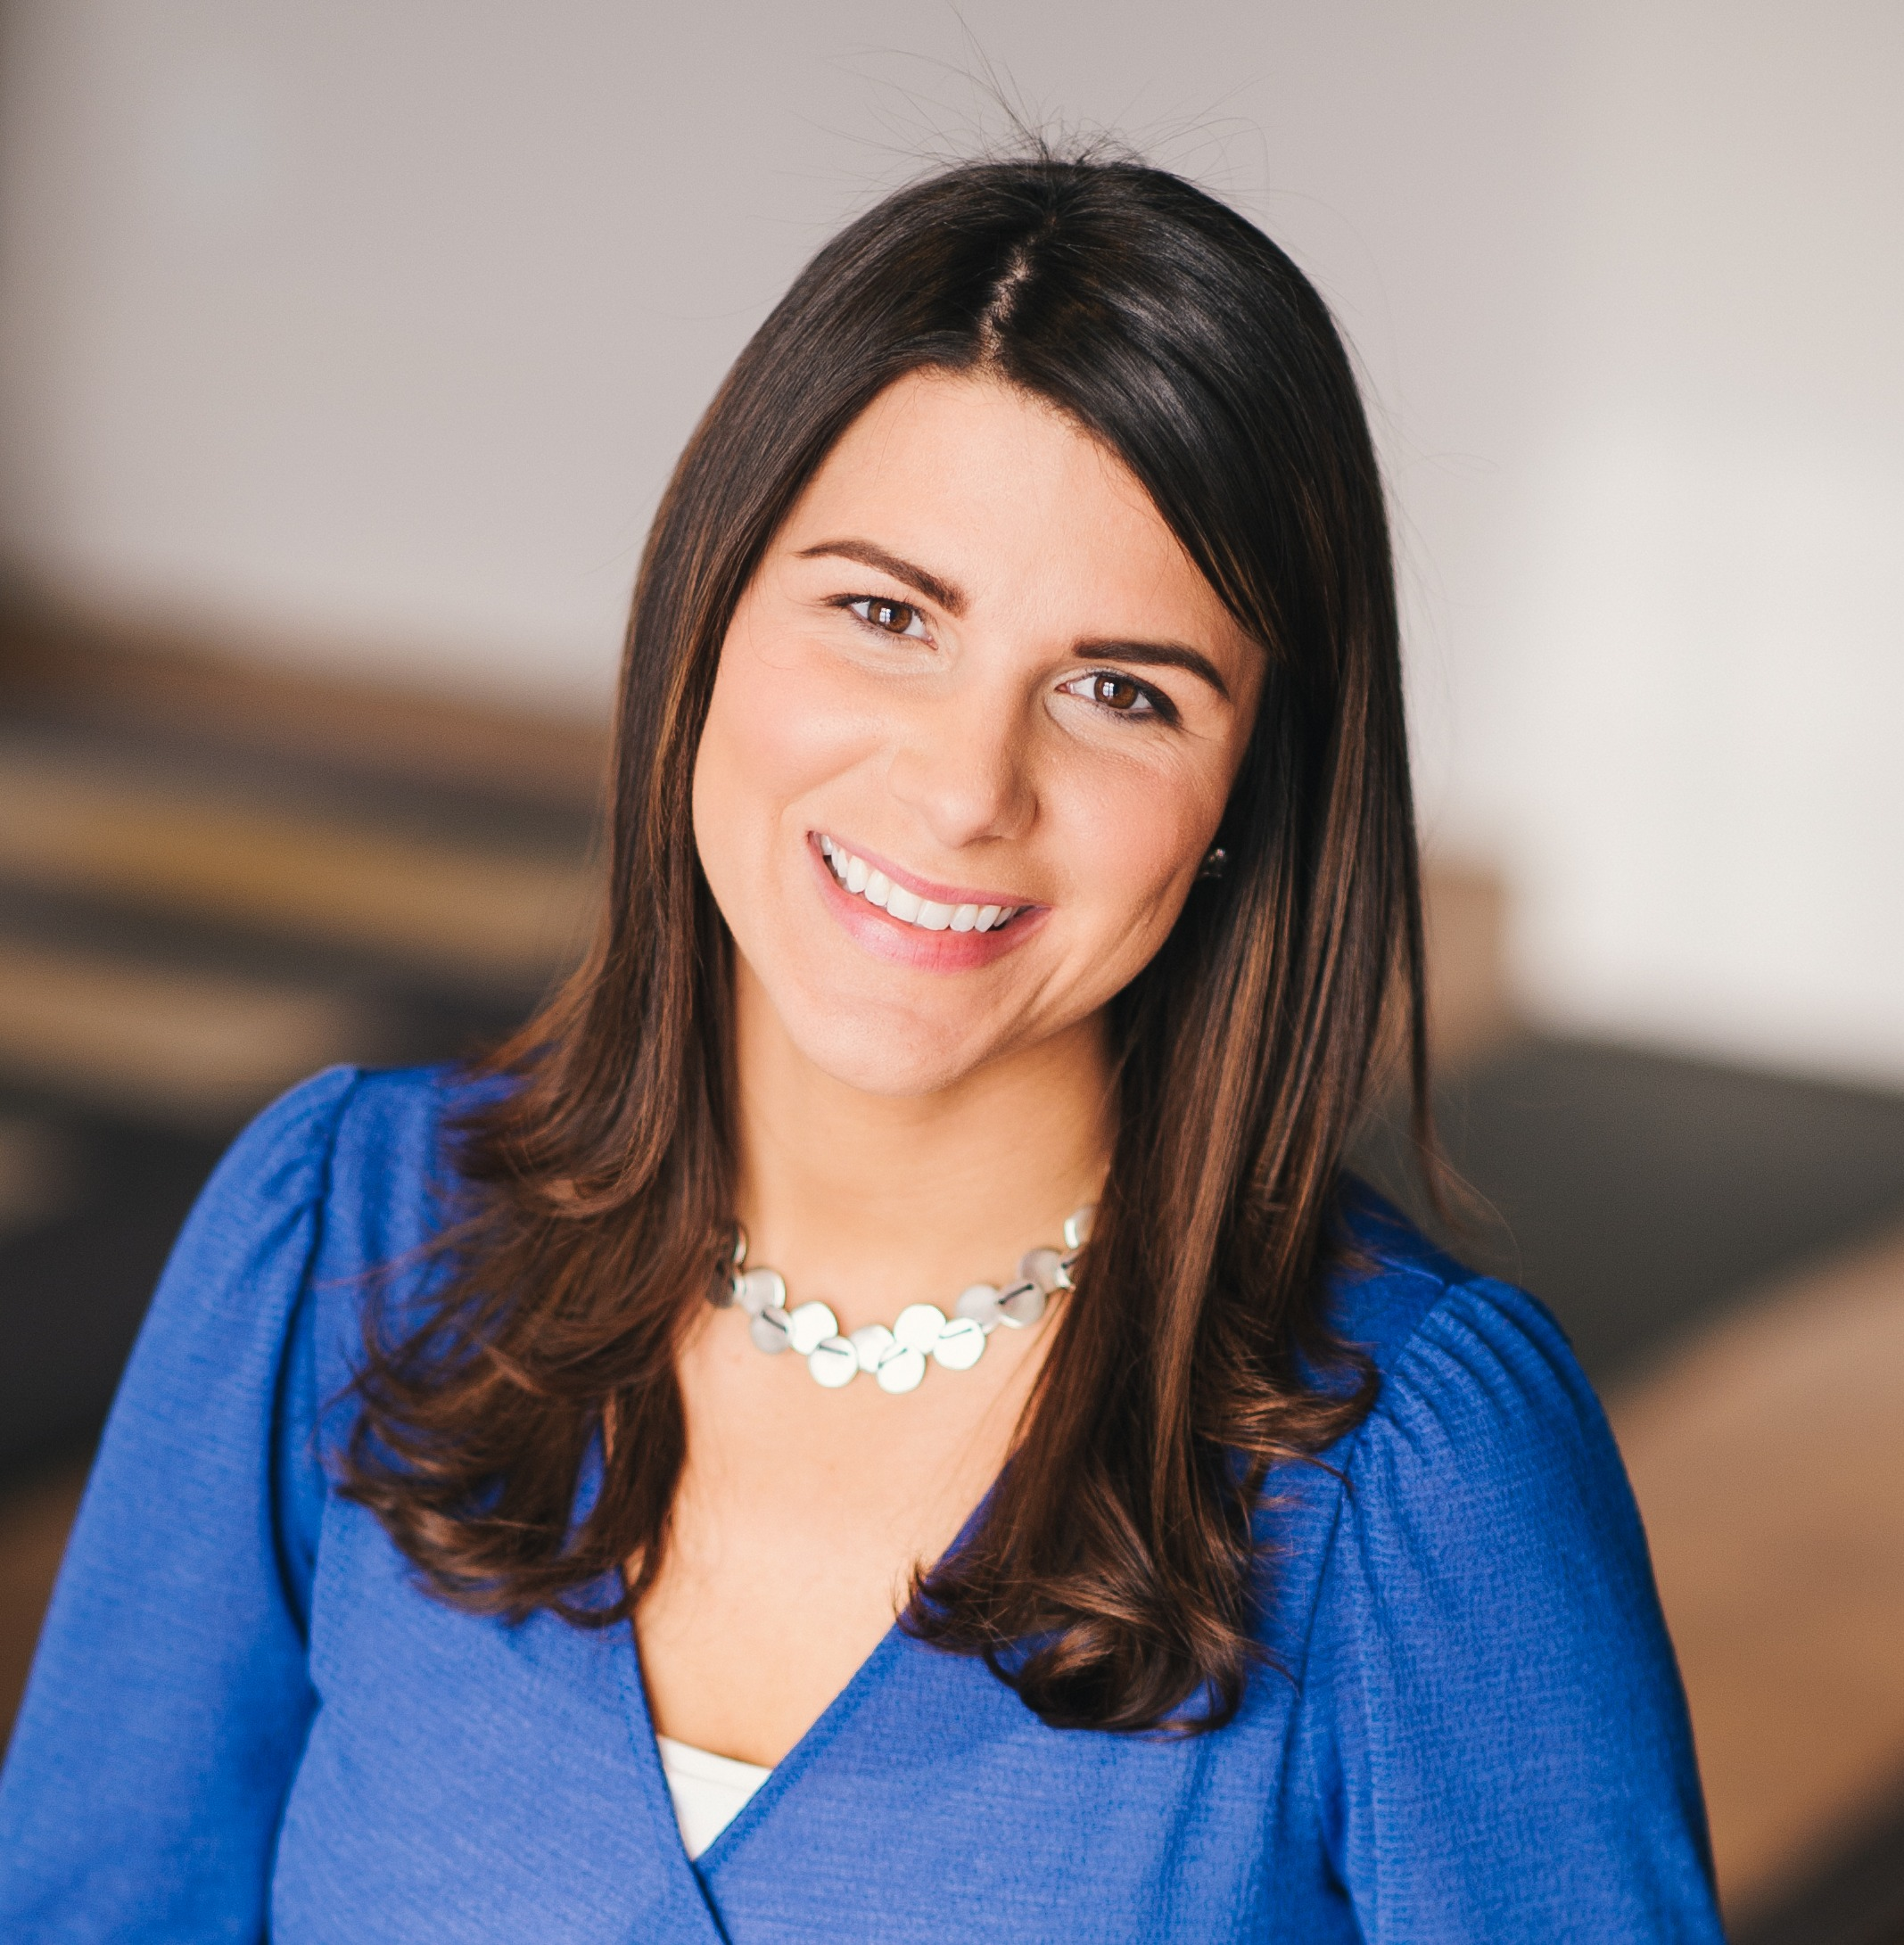 Natalie Gleason